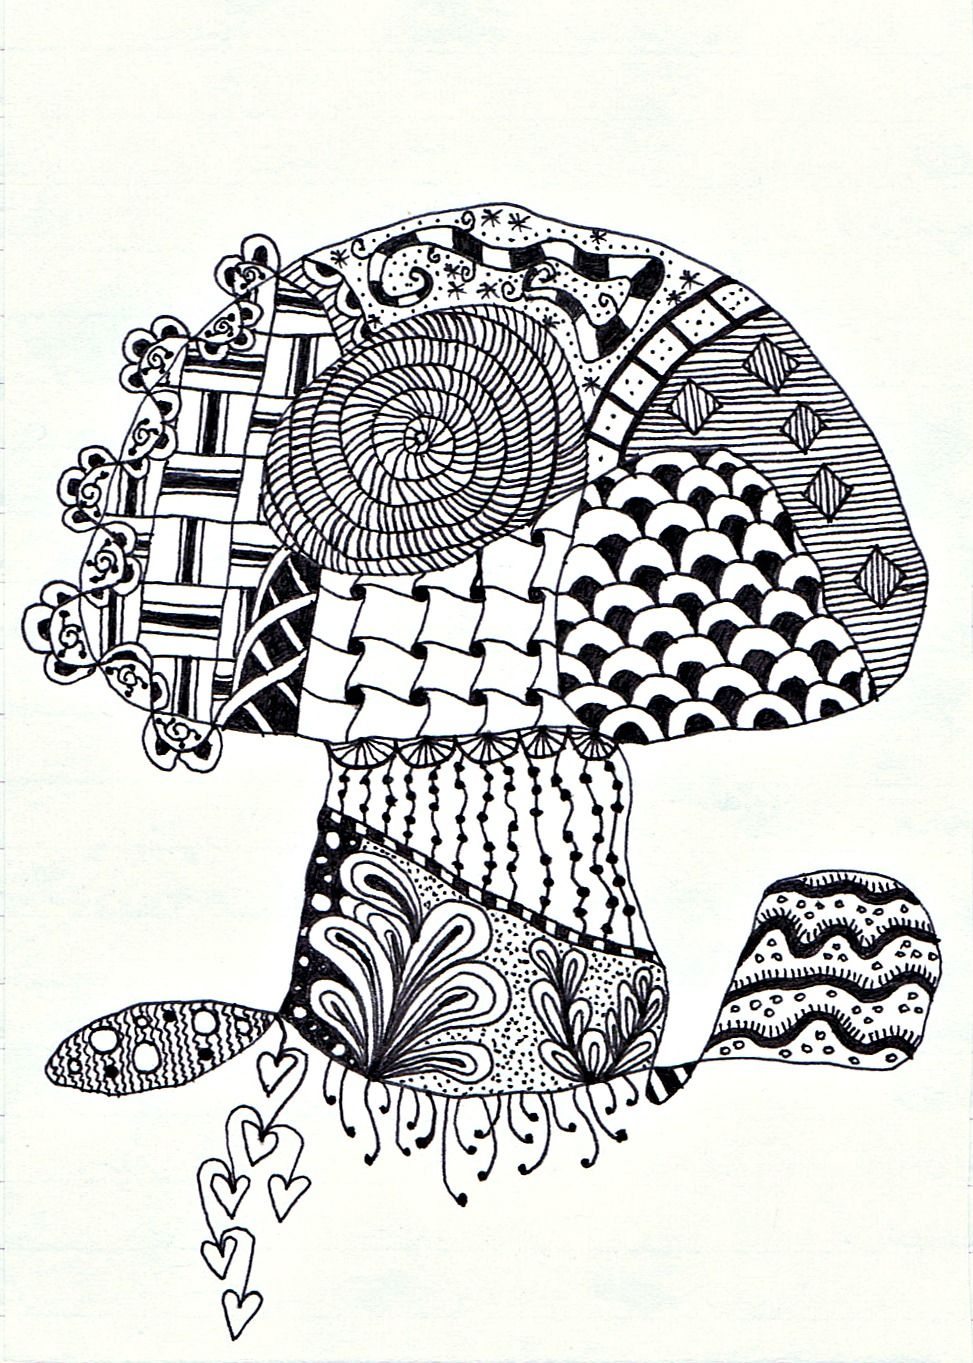 zentangle art for kids - Google Search | Zentangle ...